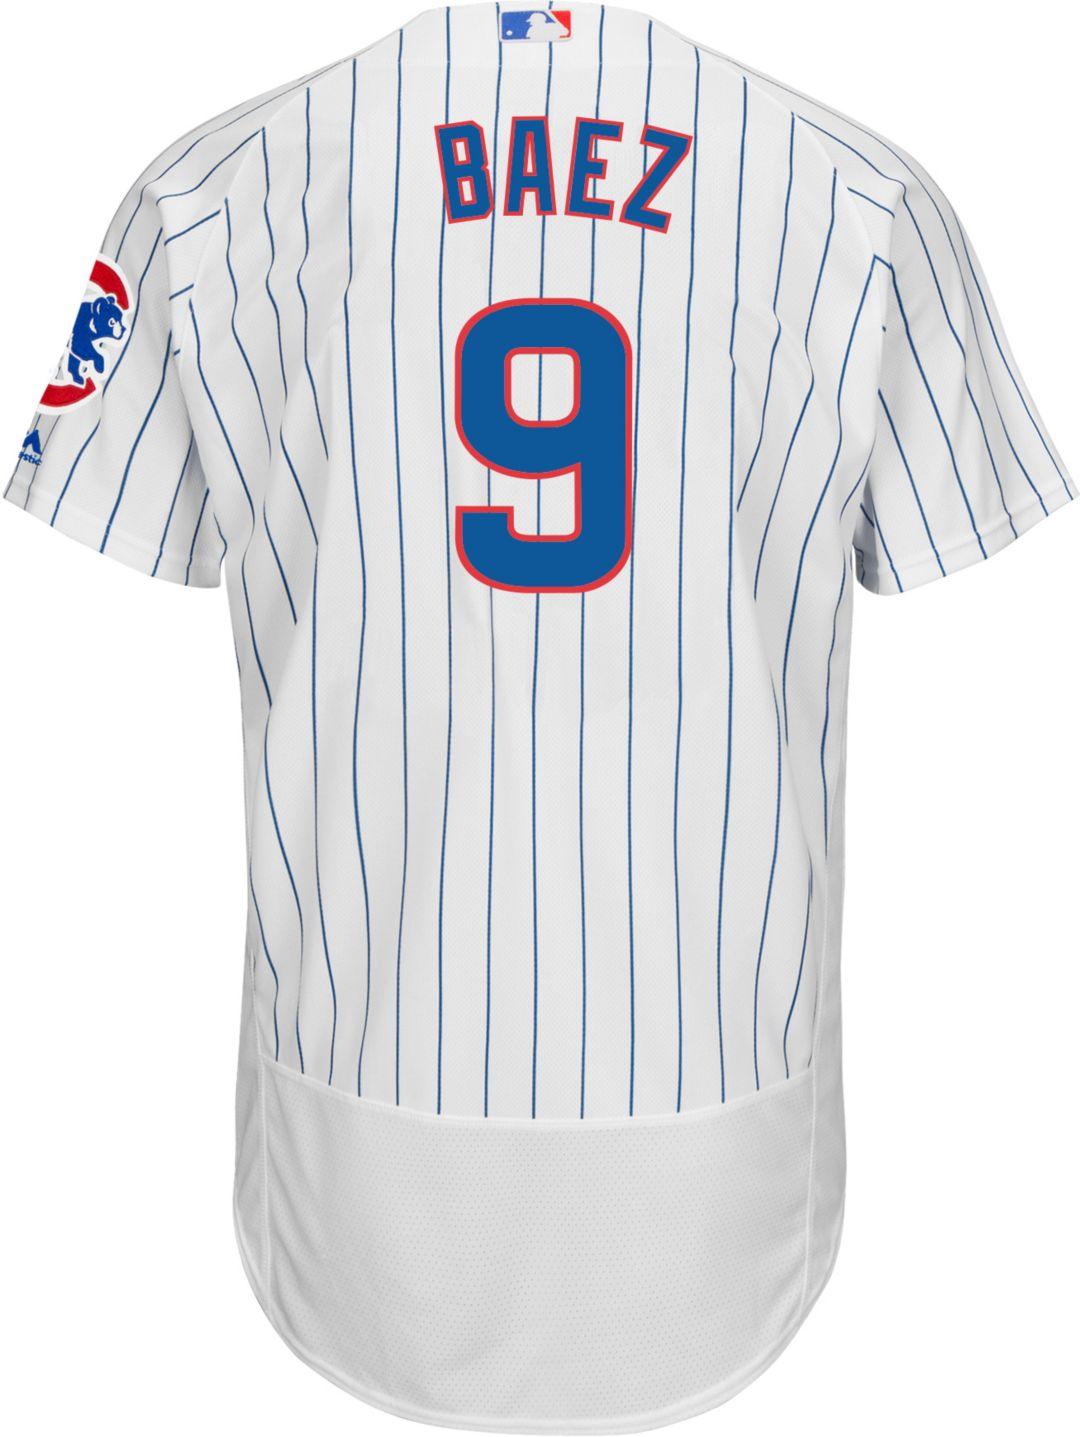 huge discount e79f0 ef950 Majestic Men's Authentic Chicago Cubs Javier Baez #9 Home White Flex Base  On-Field Jersey